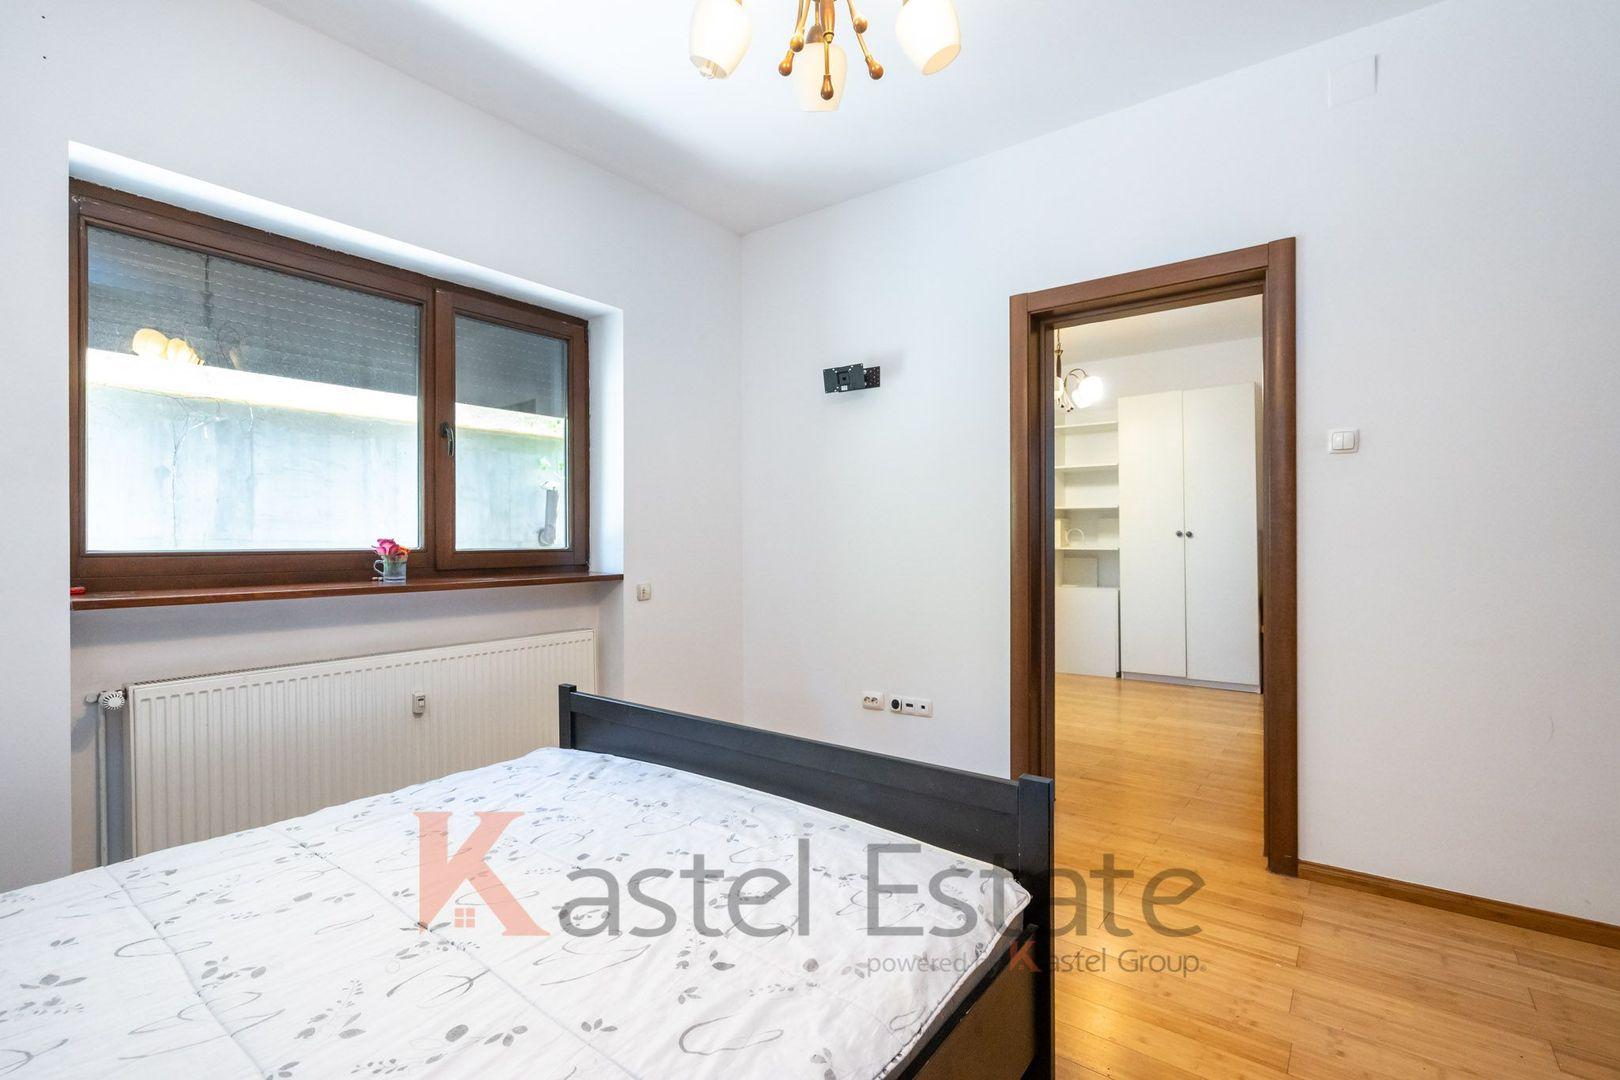 Apartament cu 3 camere | Bucuresti Mall | Comision 0